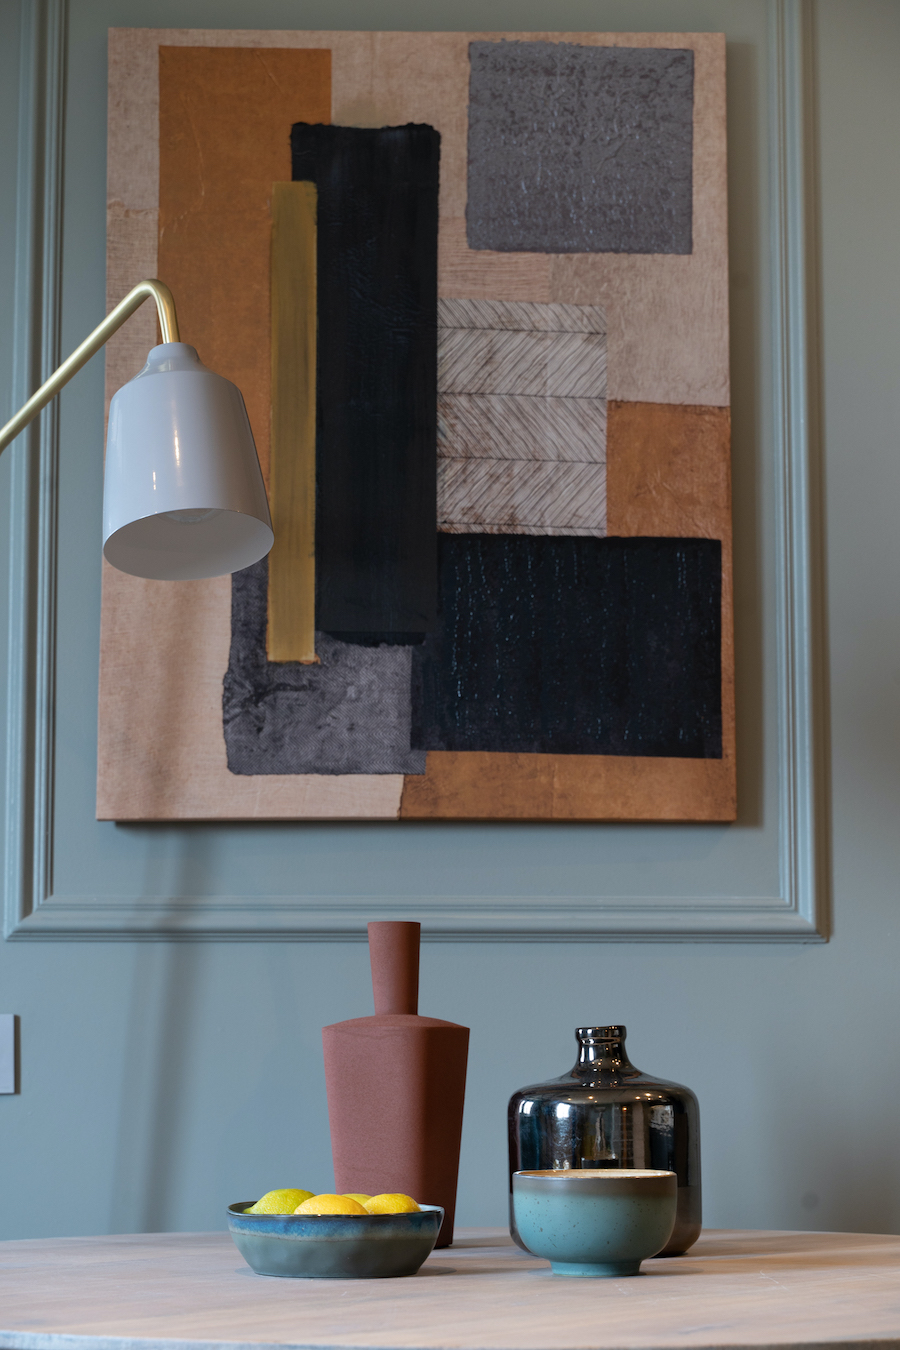 Detalle de la pared pintada de azul verdoso con molduras de escayola.